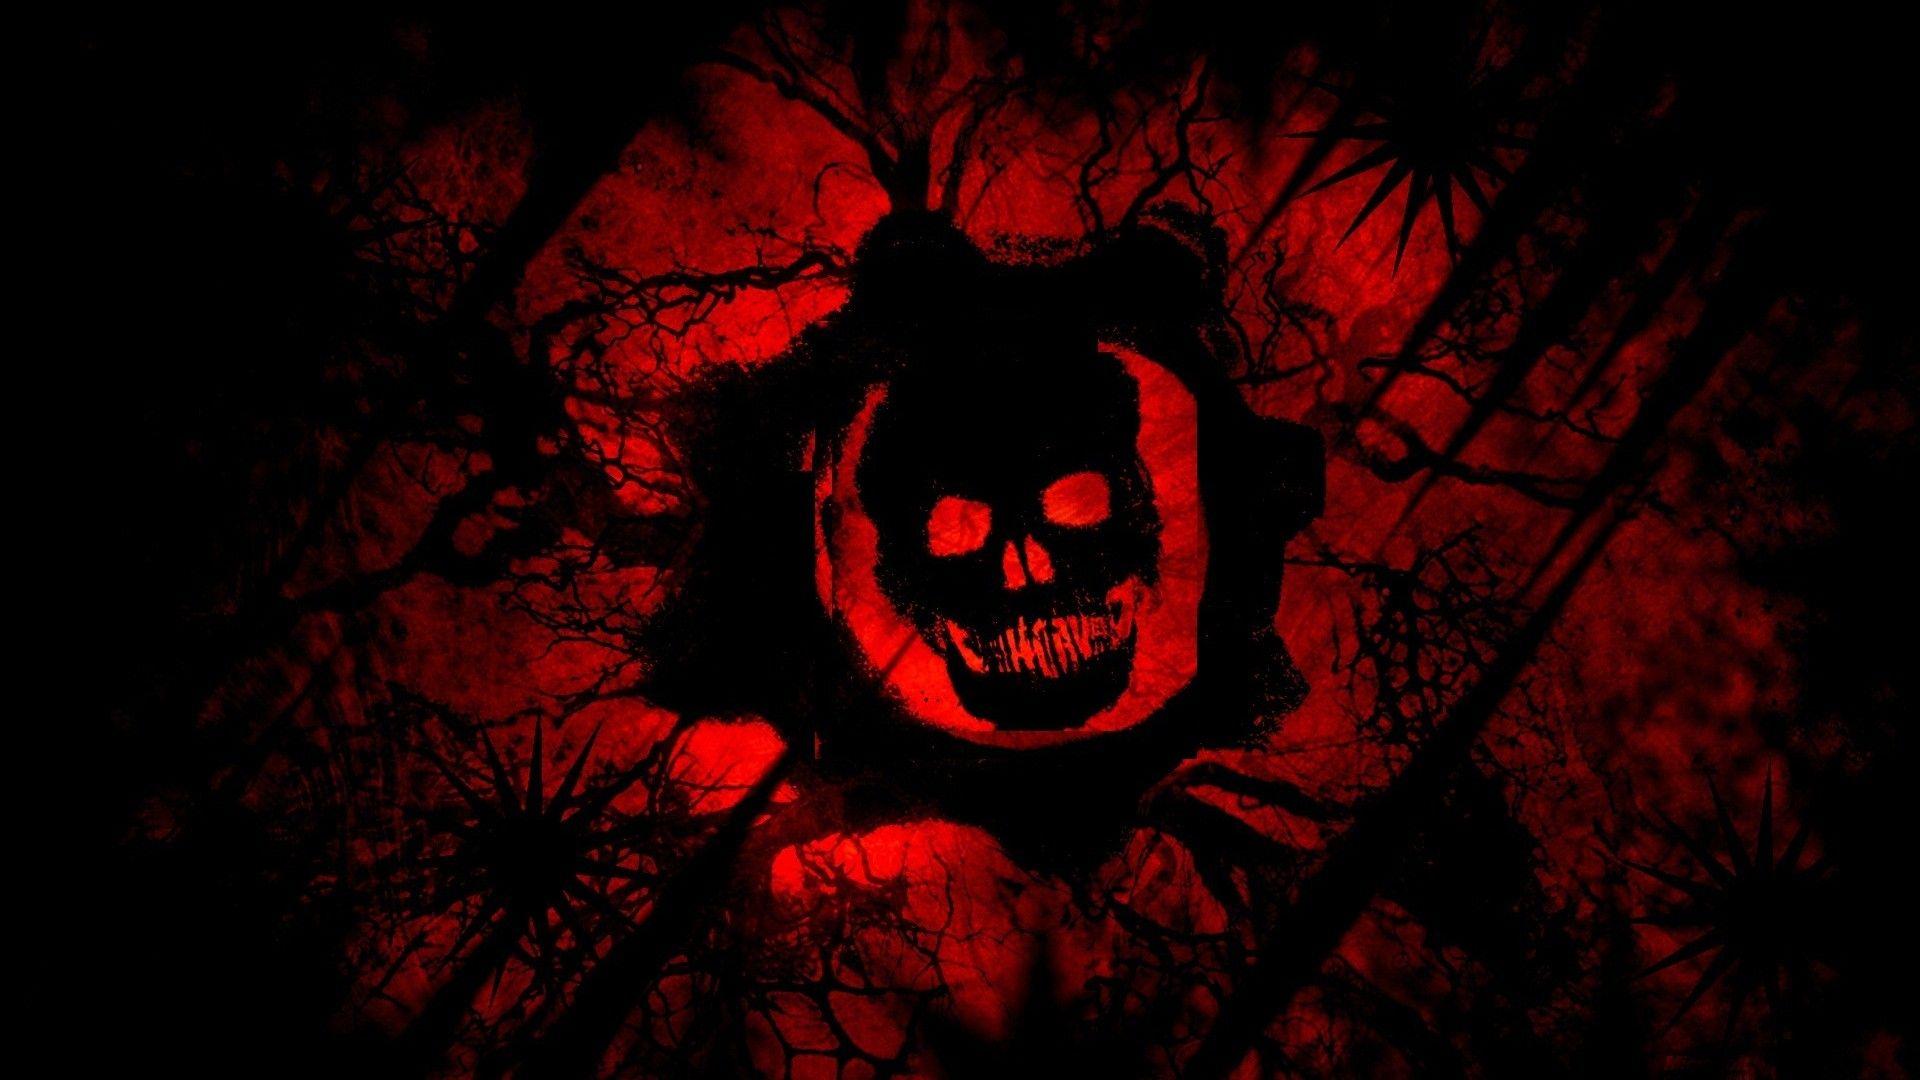 Gears Of War Red Wallpaper Gears Of War Gears Of War 3 Red